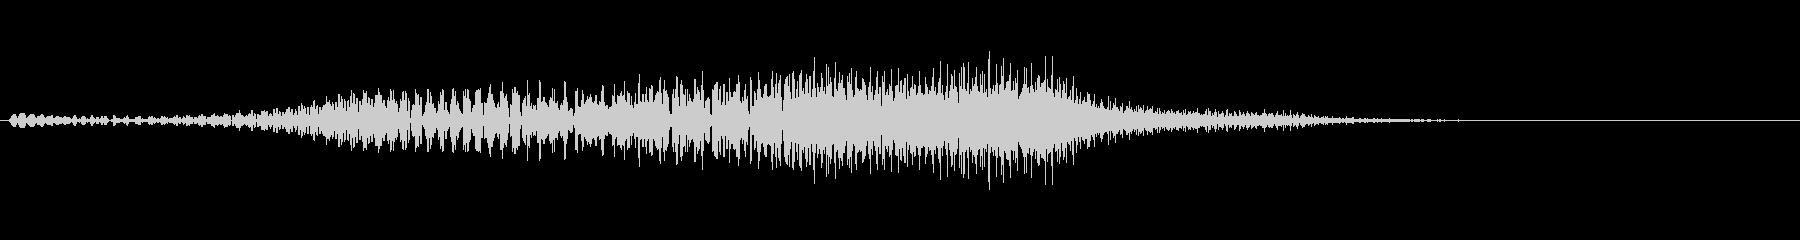 【SE 効果音】SF的な音17の未再生の波形